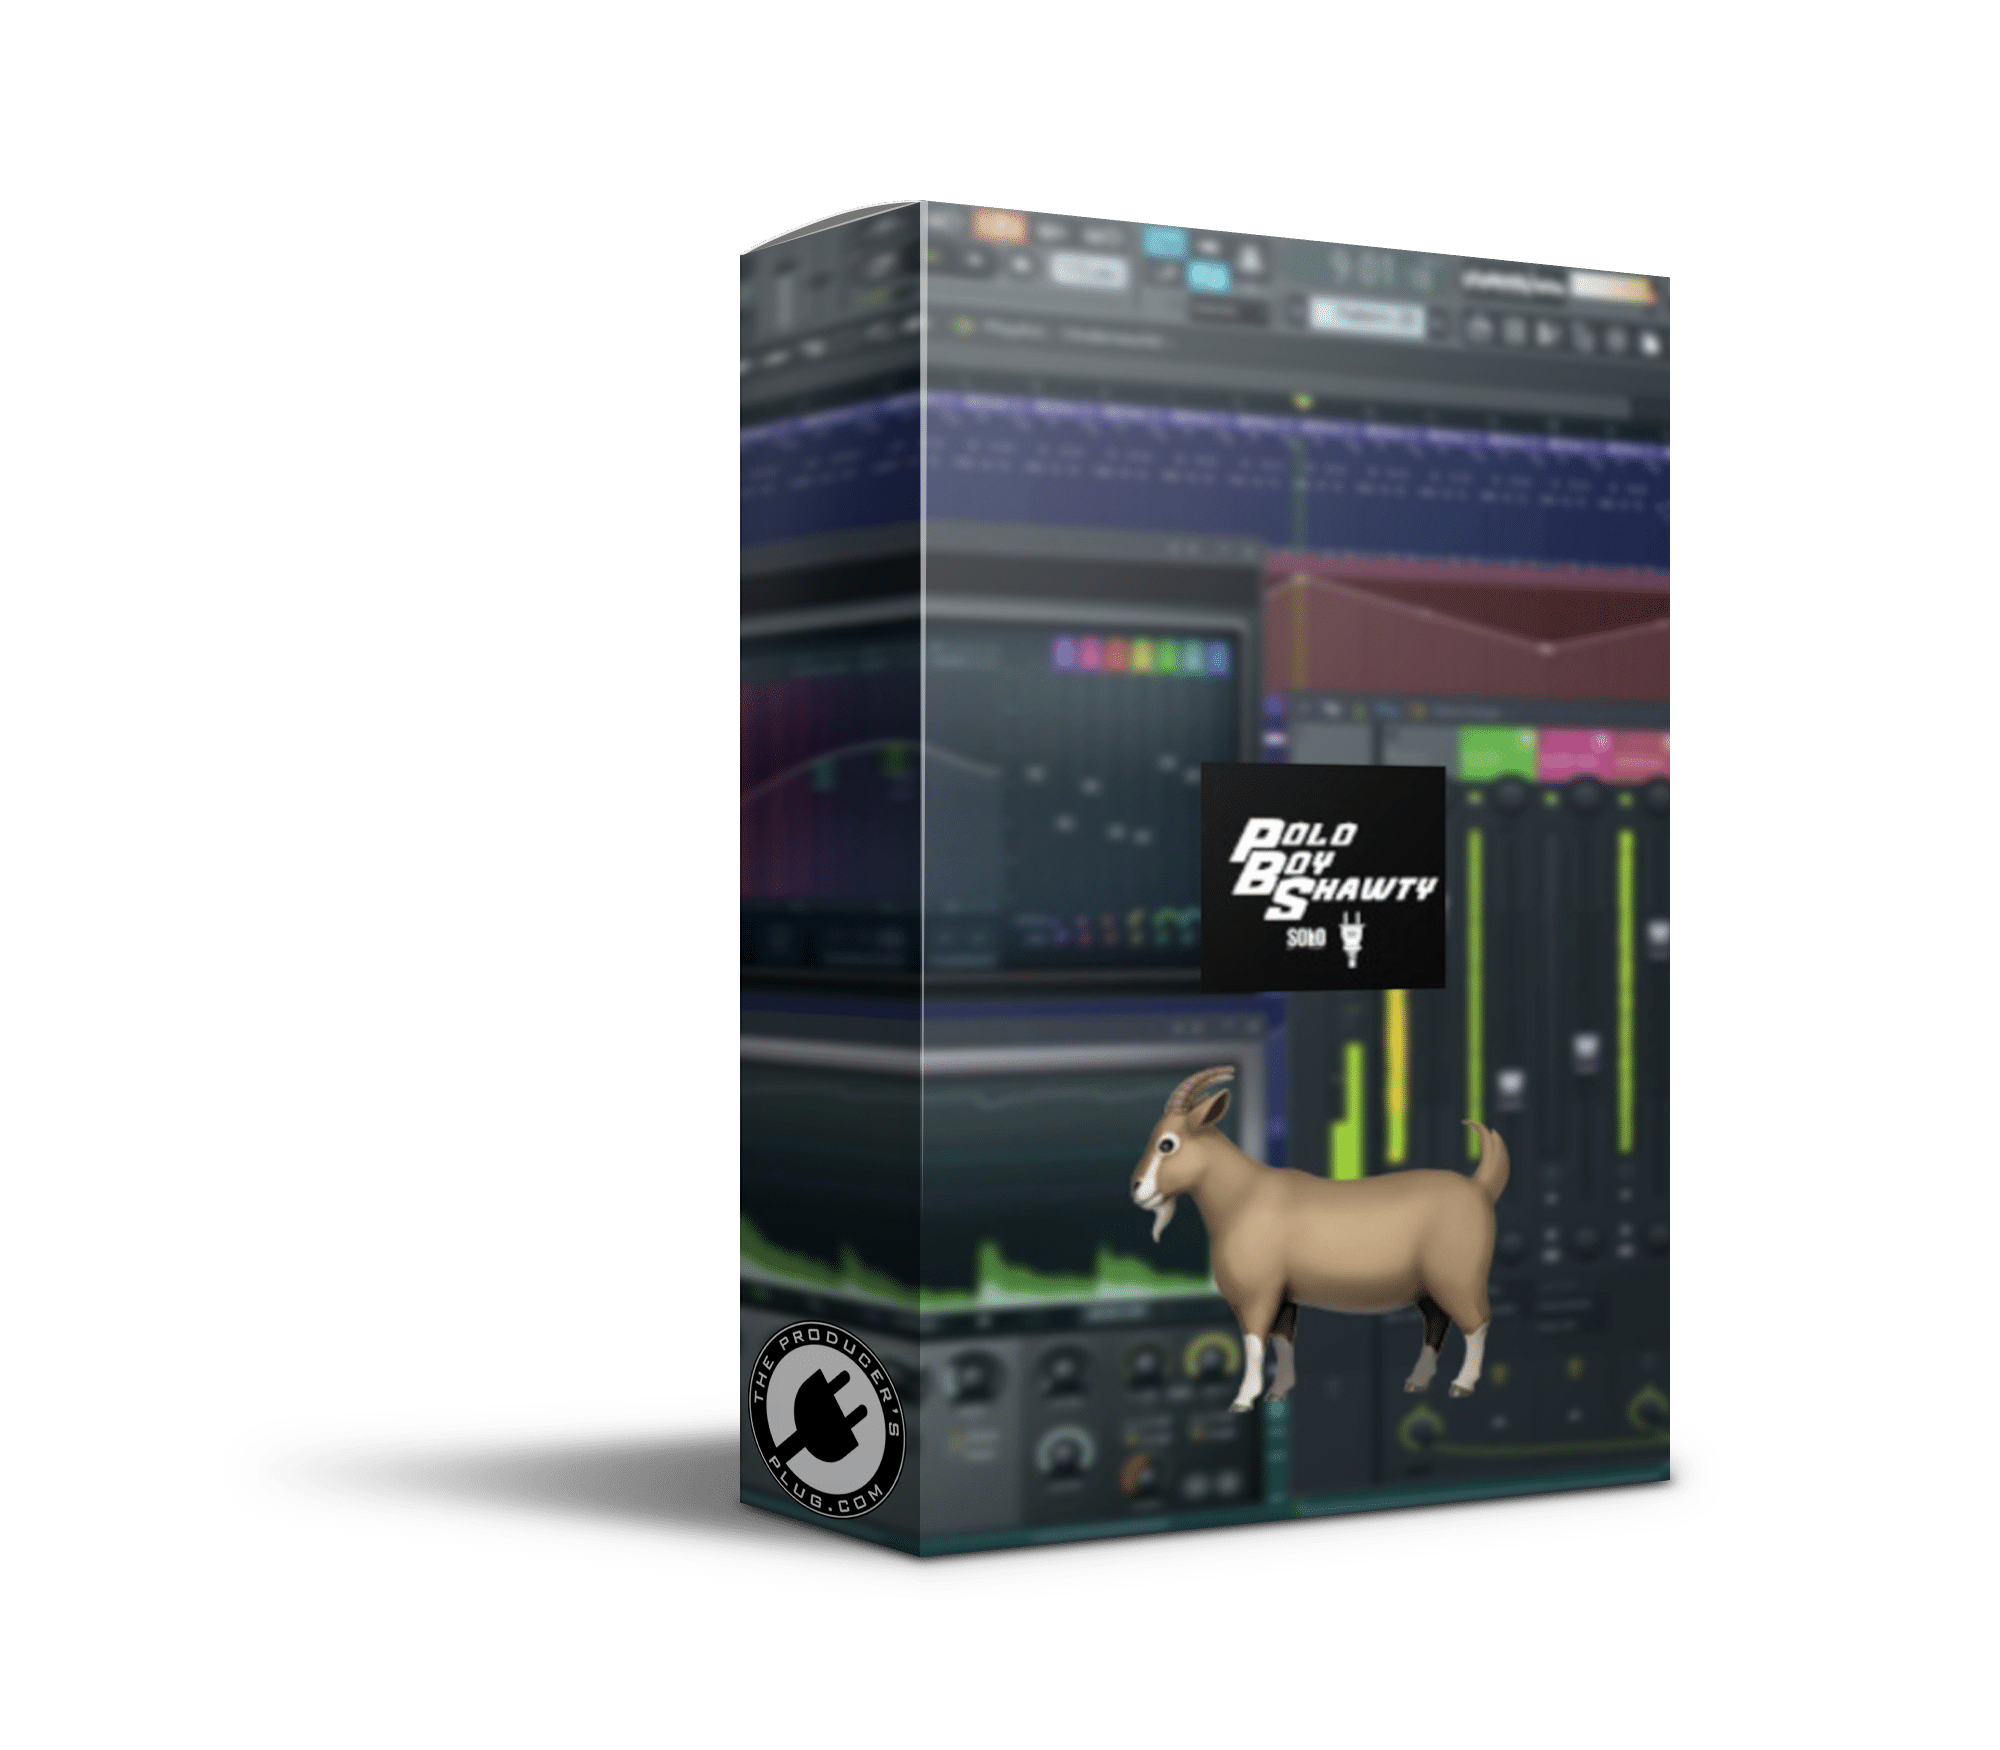 The Producer's Plug – Polo Boy Shawty – GOAT Drum Kit